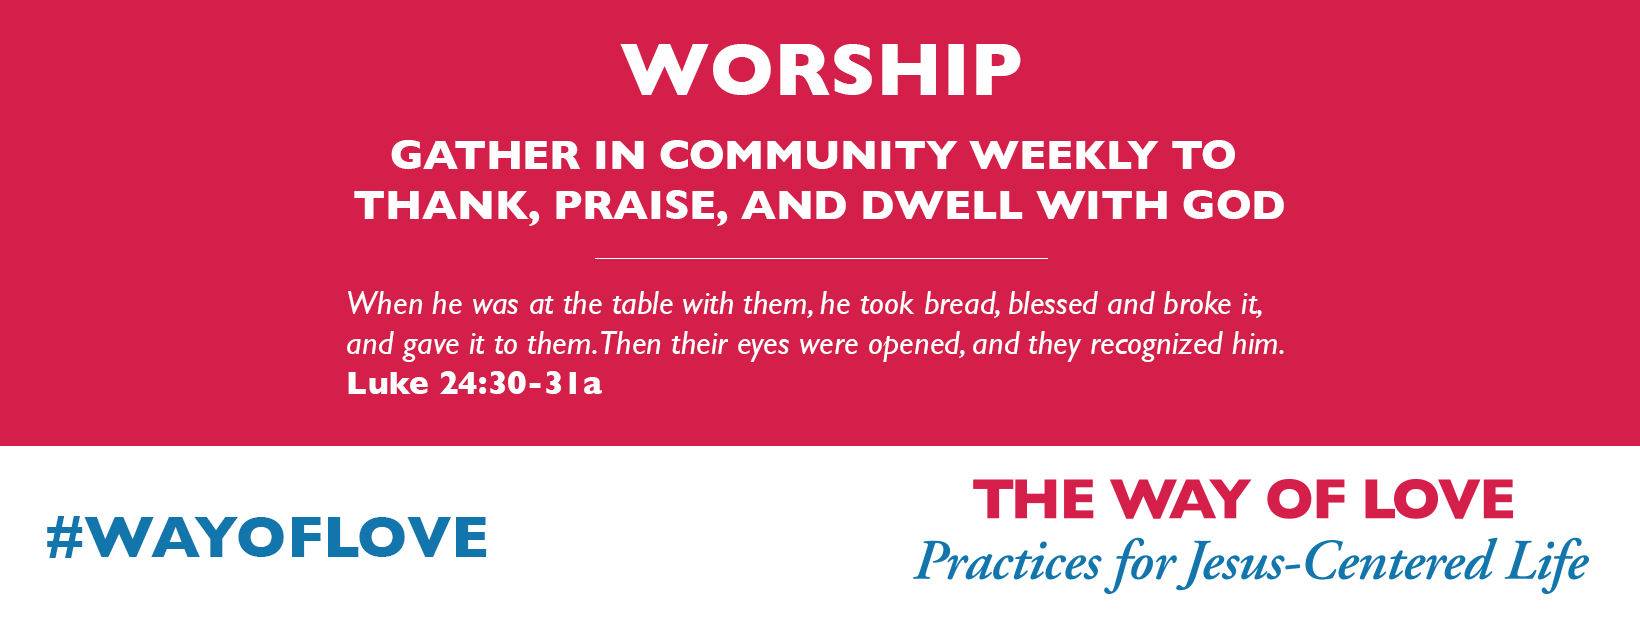 Way of Love - Worship